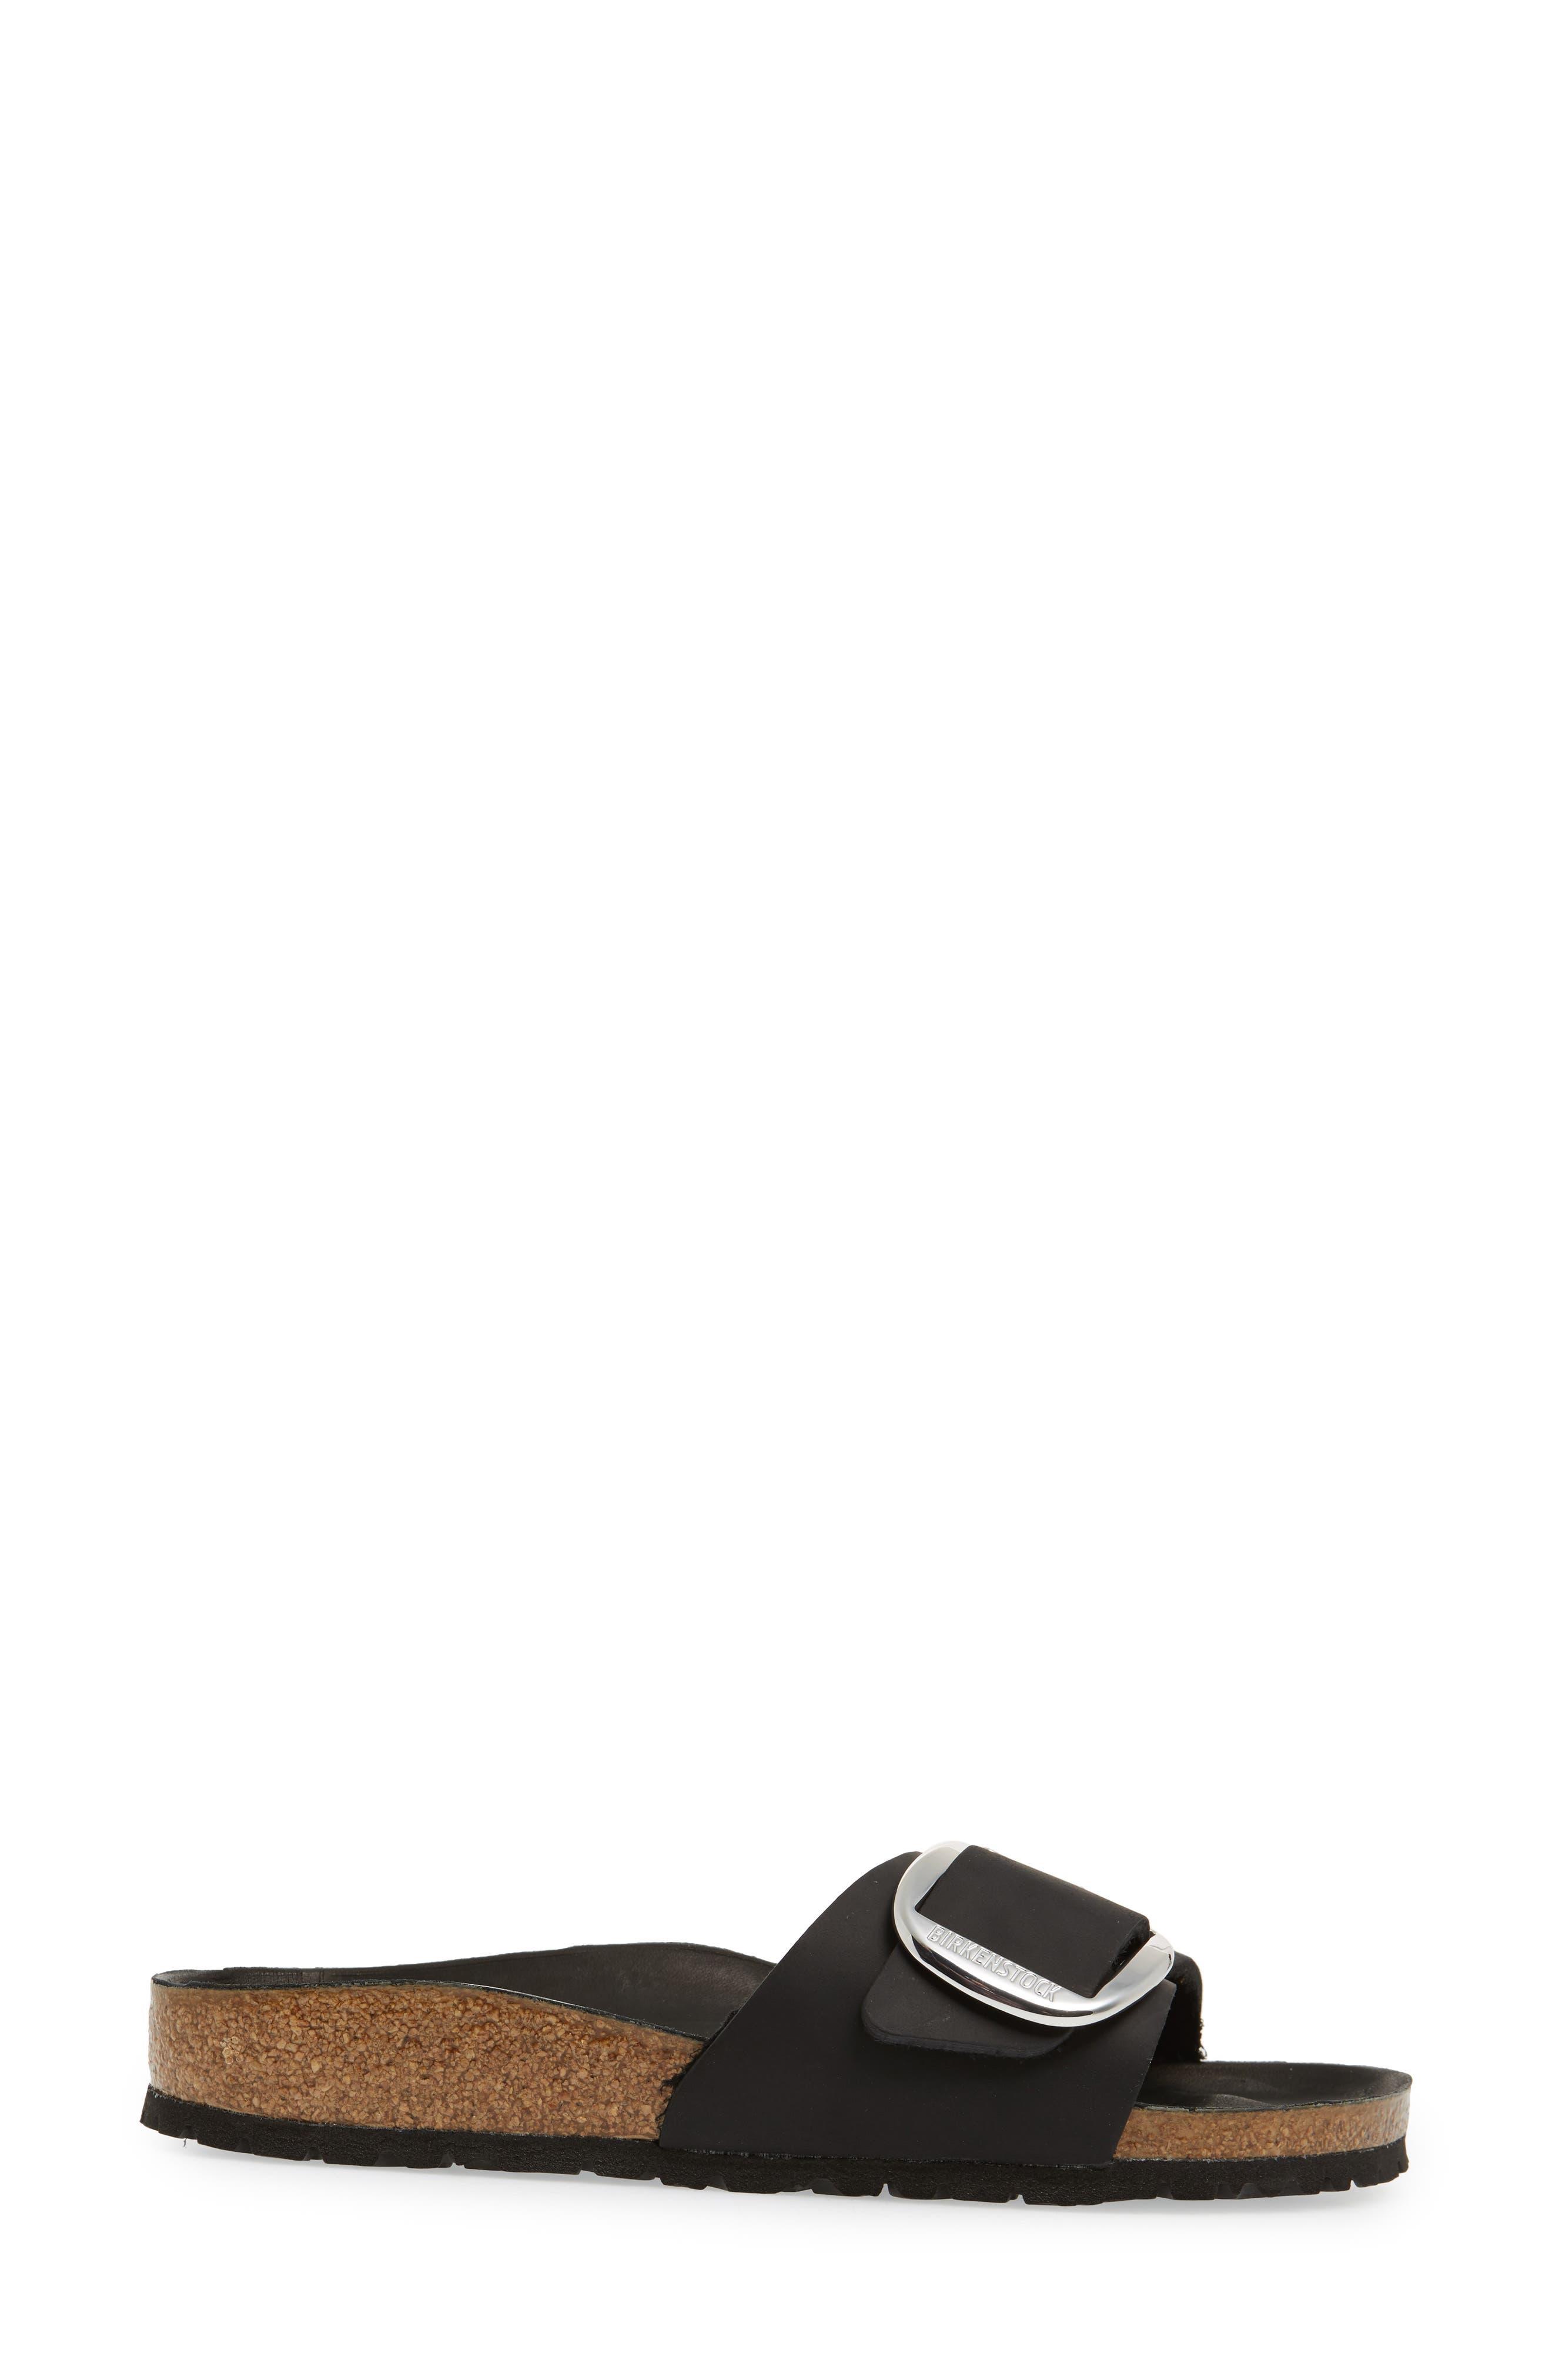 Madrid Big Buckle Slide Sandal,                             Alternate thumbnail 3, color,                             Black Leather